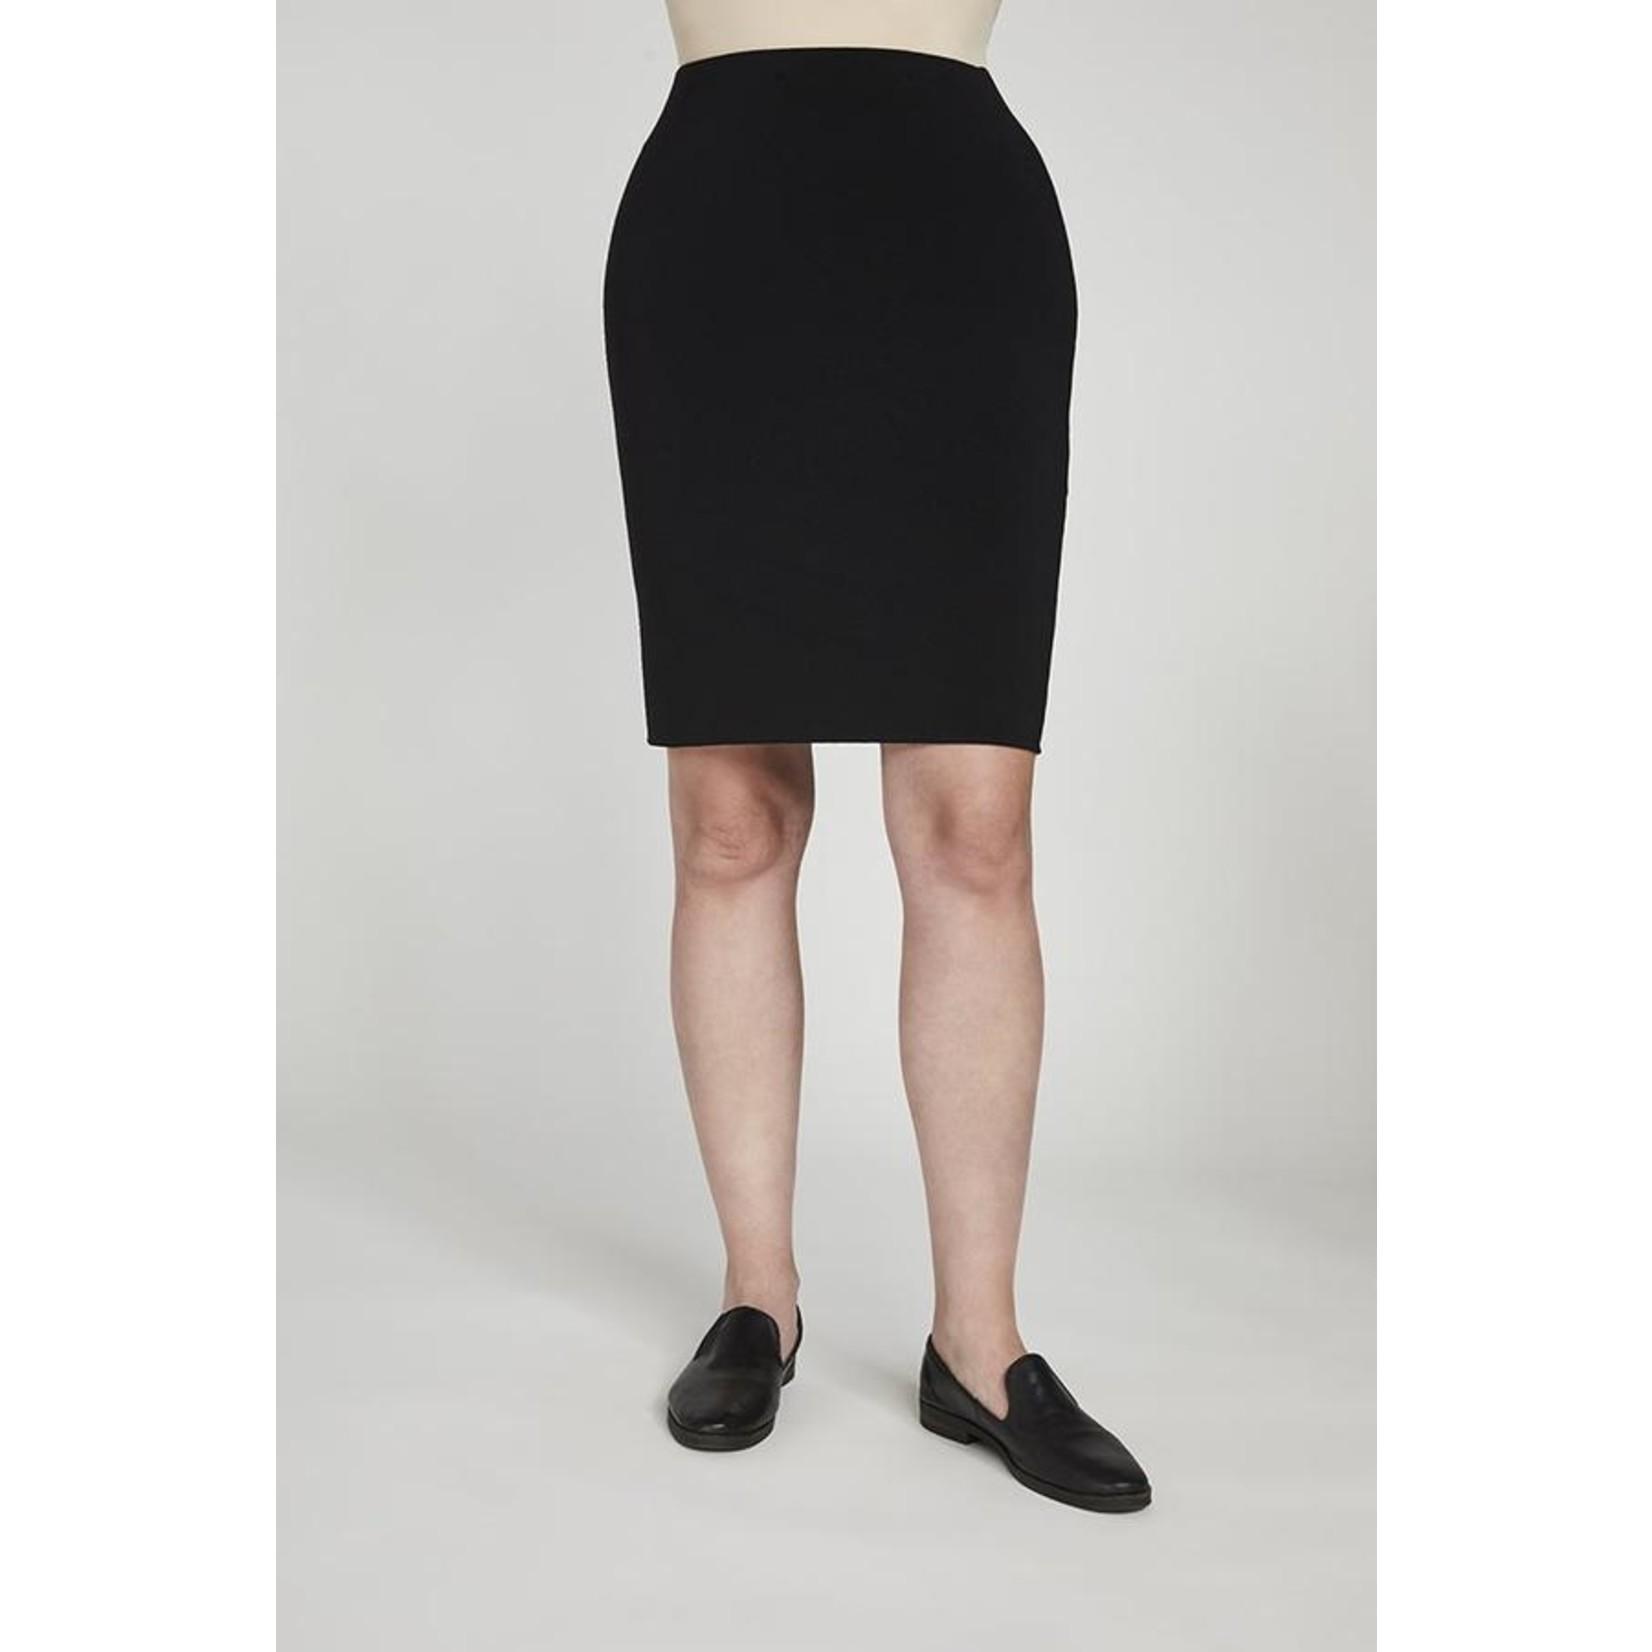 Sympli Sympli Tube Skirt - Short